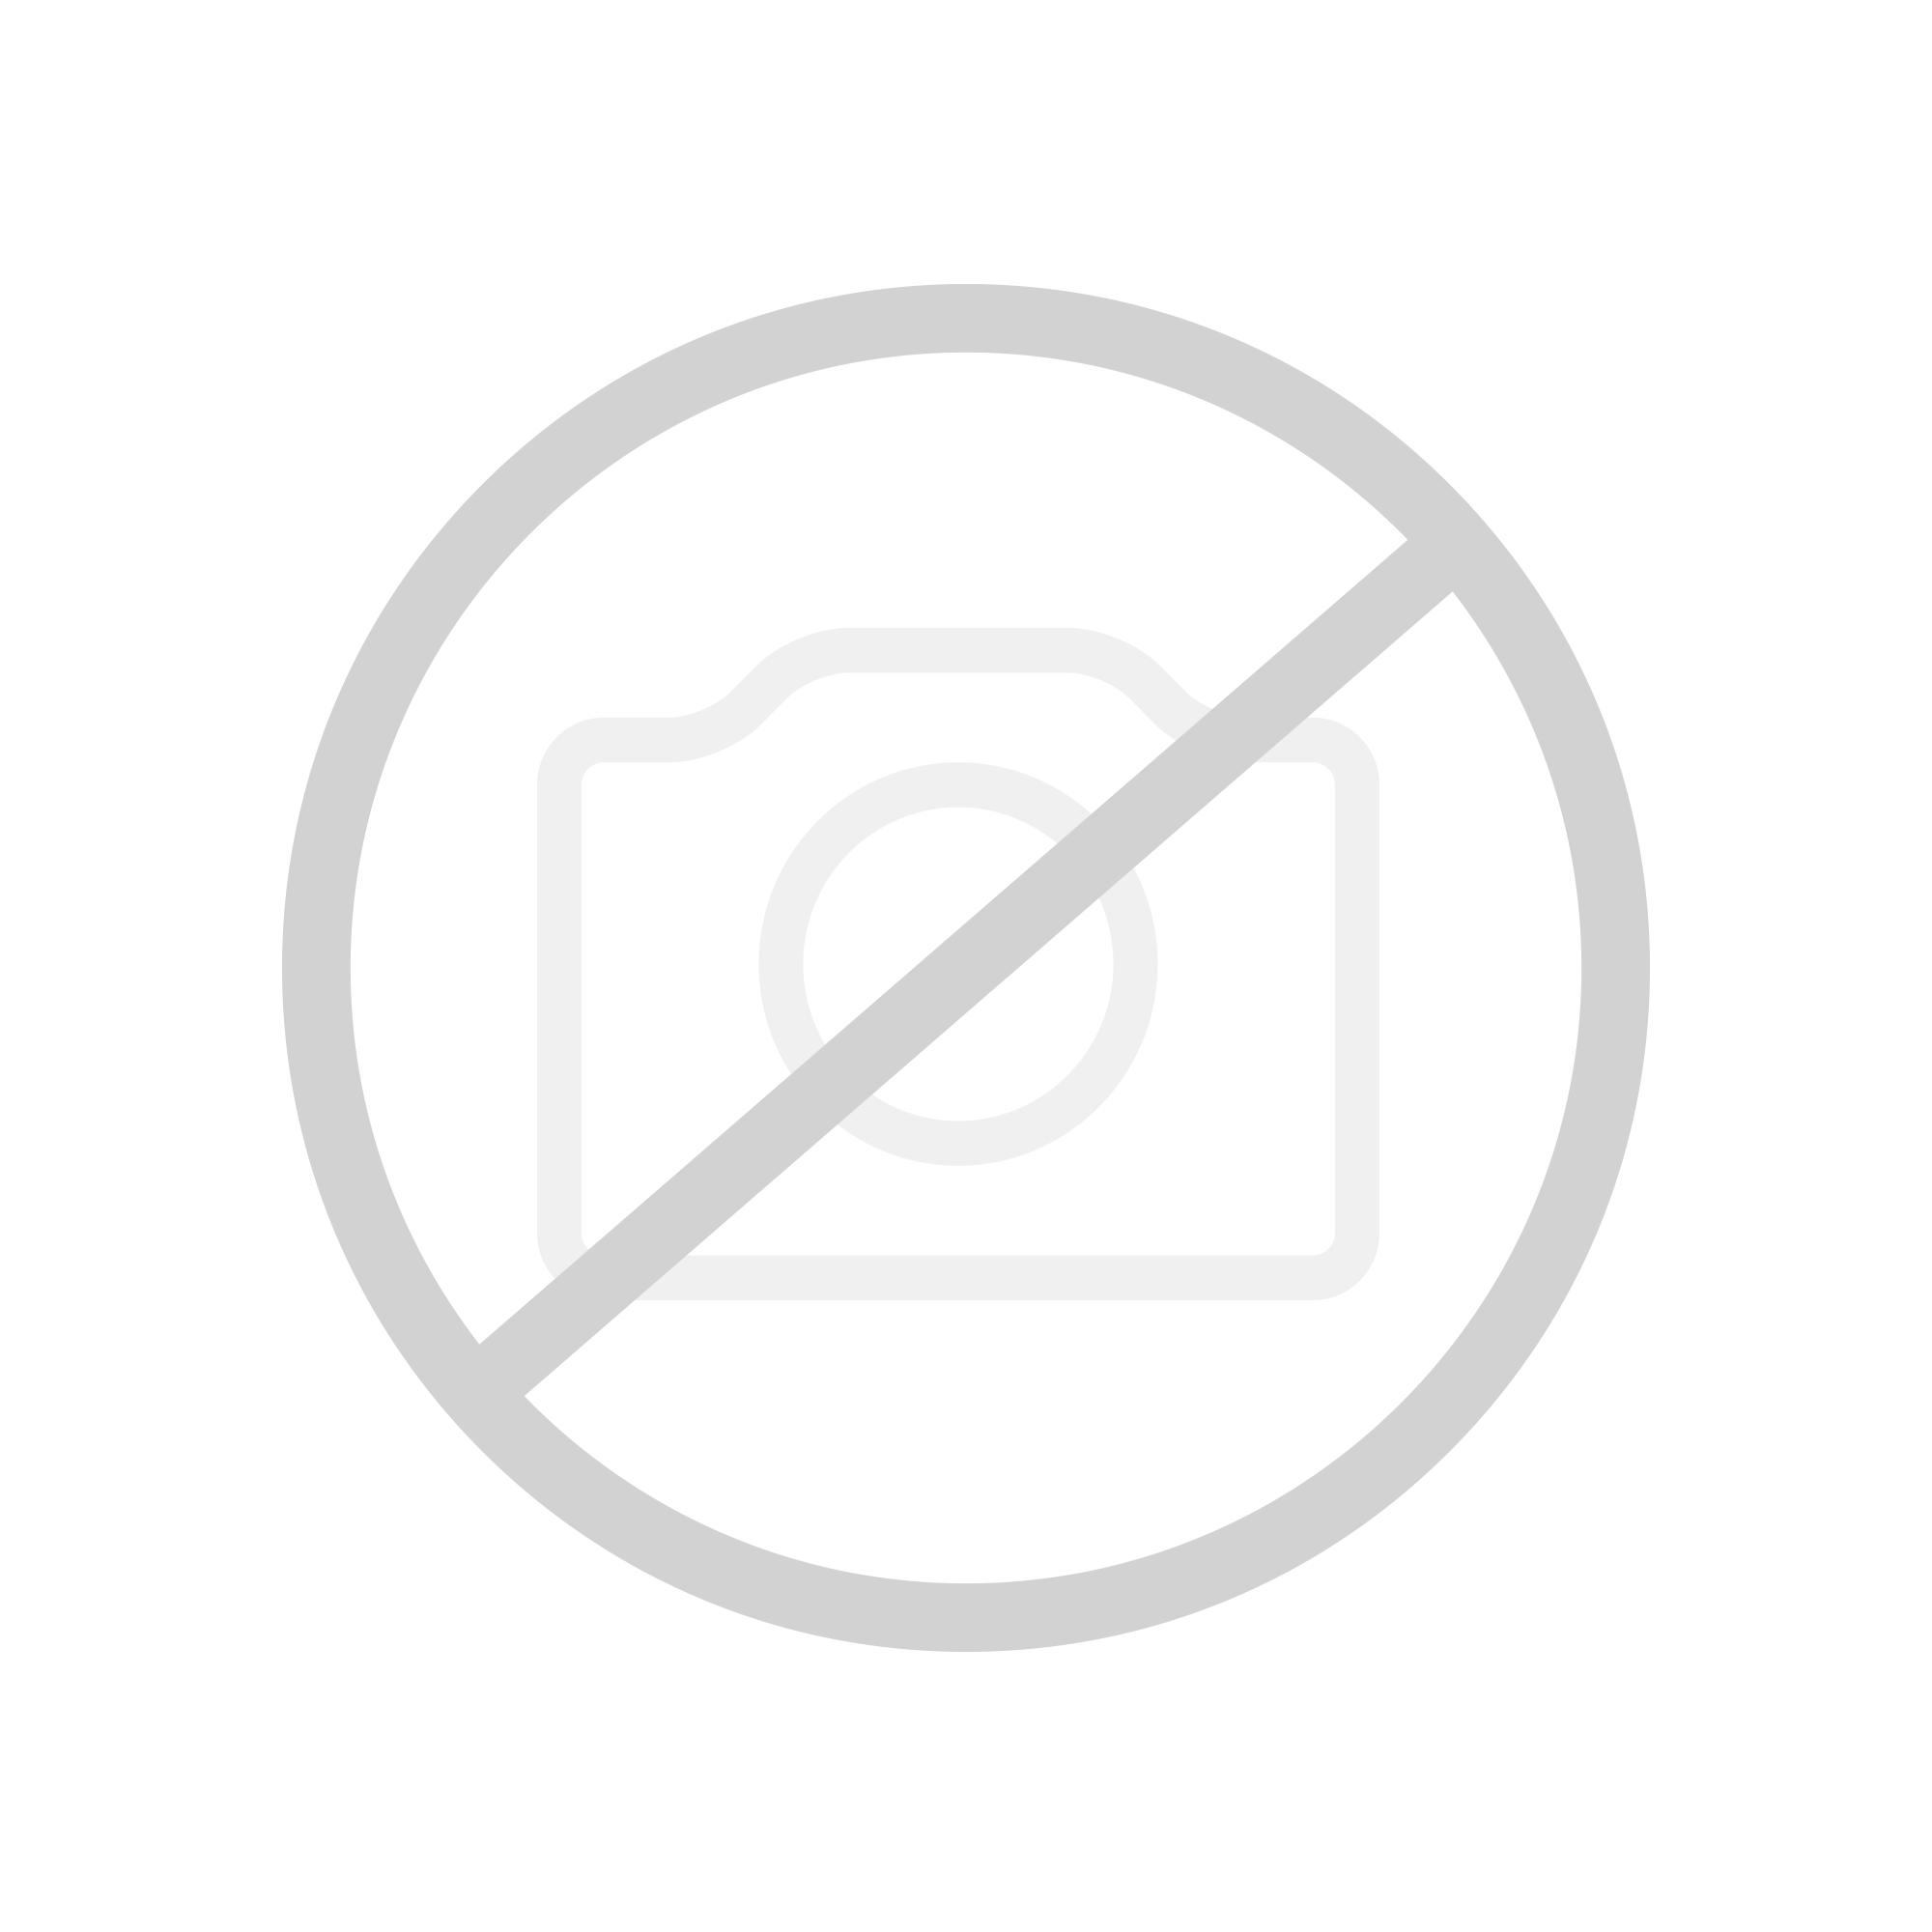 Geberit Duofix System-Dämmstreifen